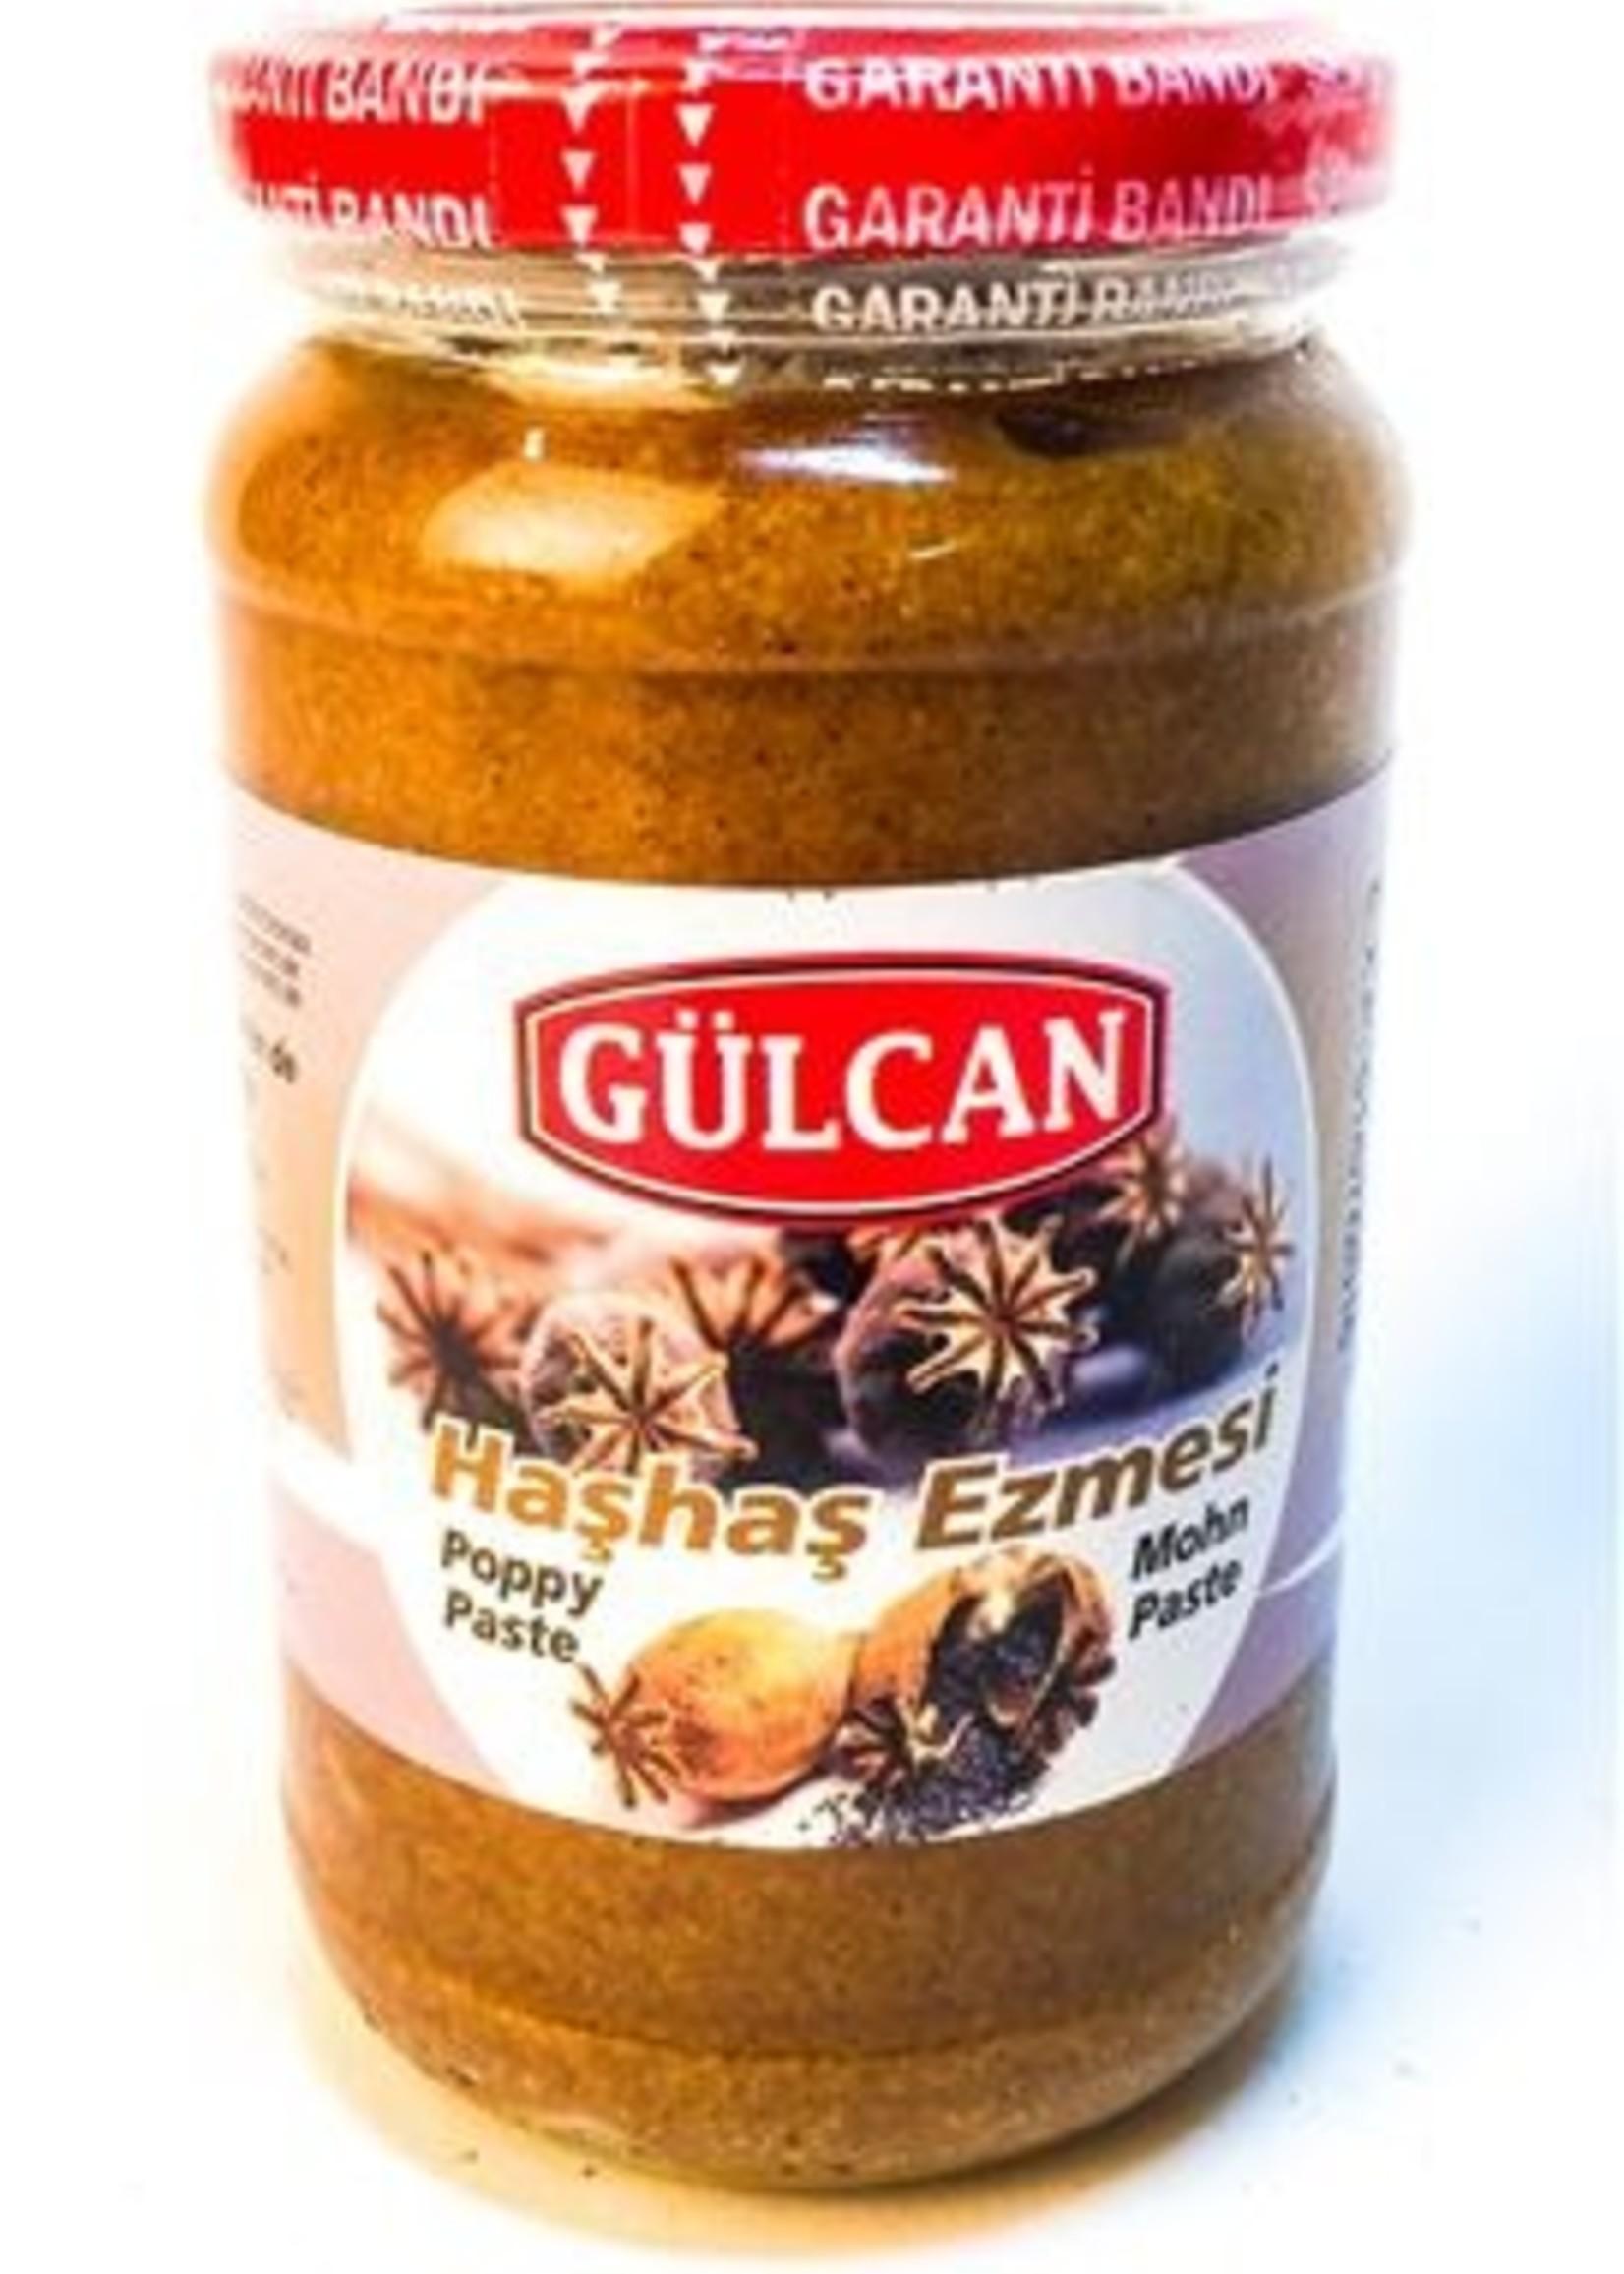 Gulcan Maanzaadpasta 350 gram